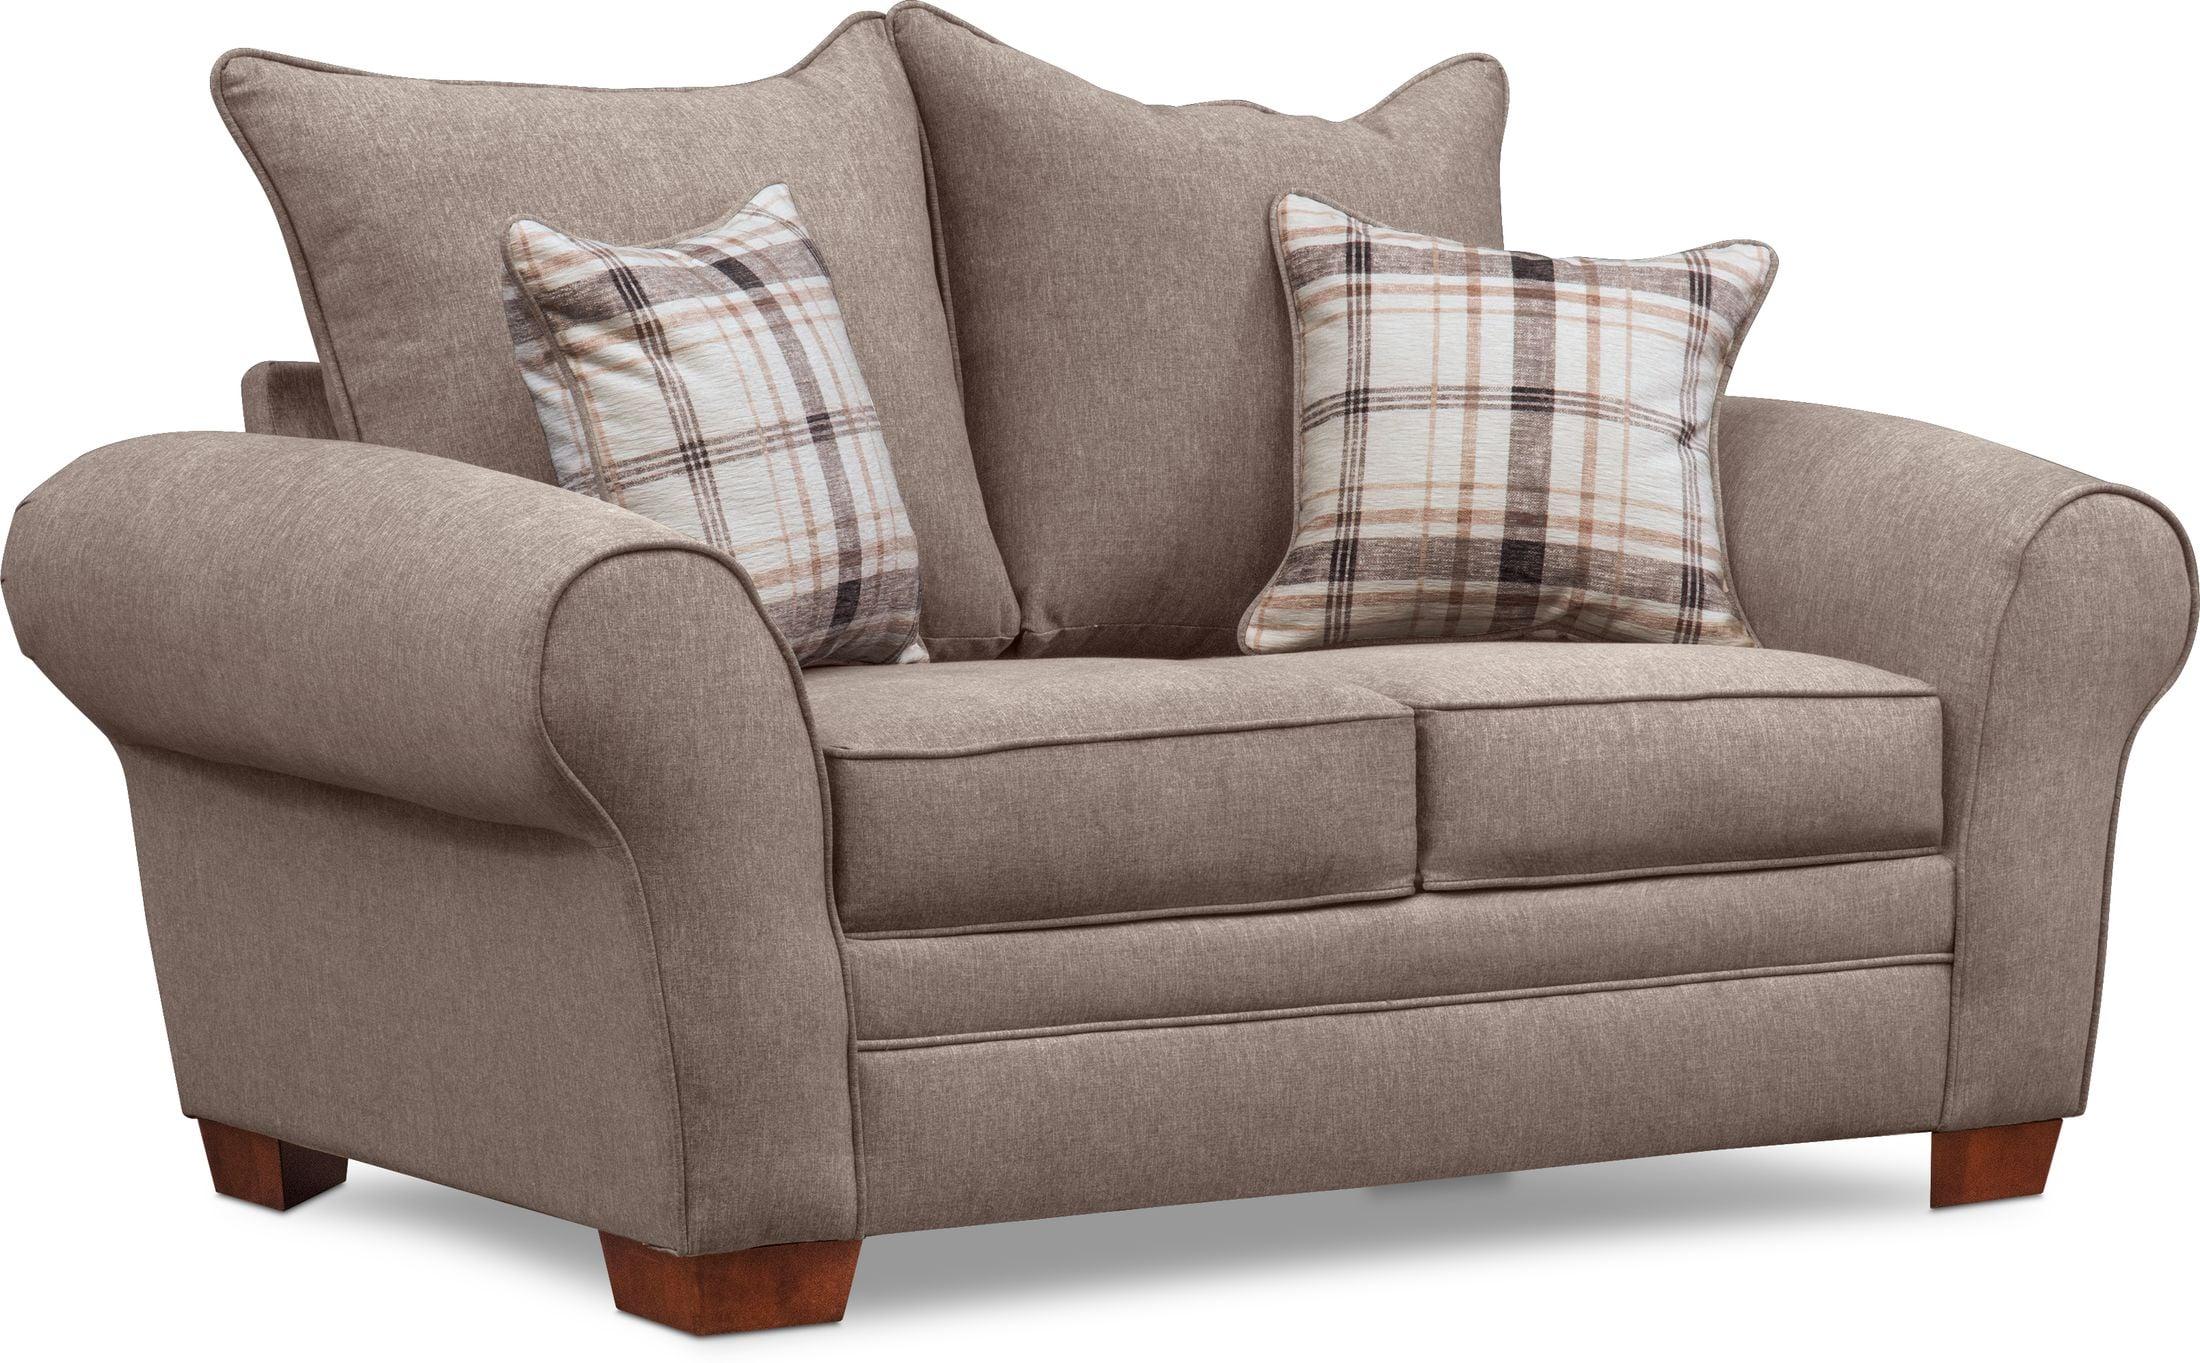 Living Room Furniture - Rowan Loveseat